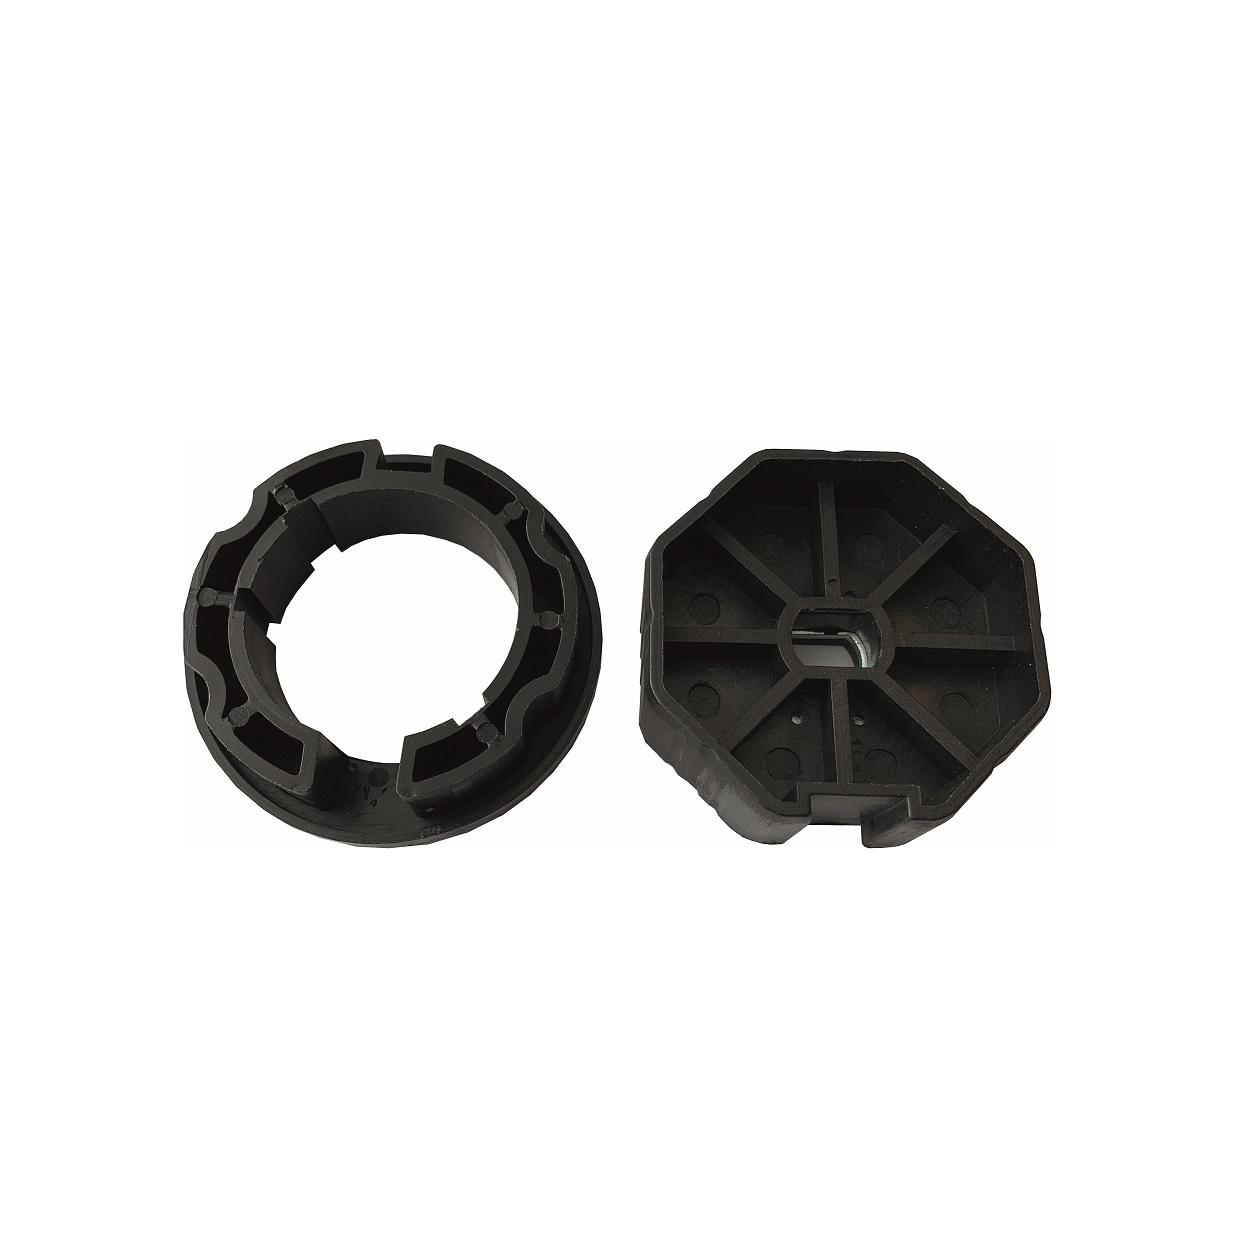 Brel Adaptieset rolluikmotoren tbv as 8 kant 70 mm